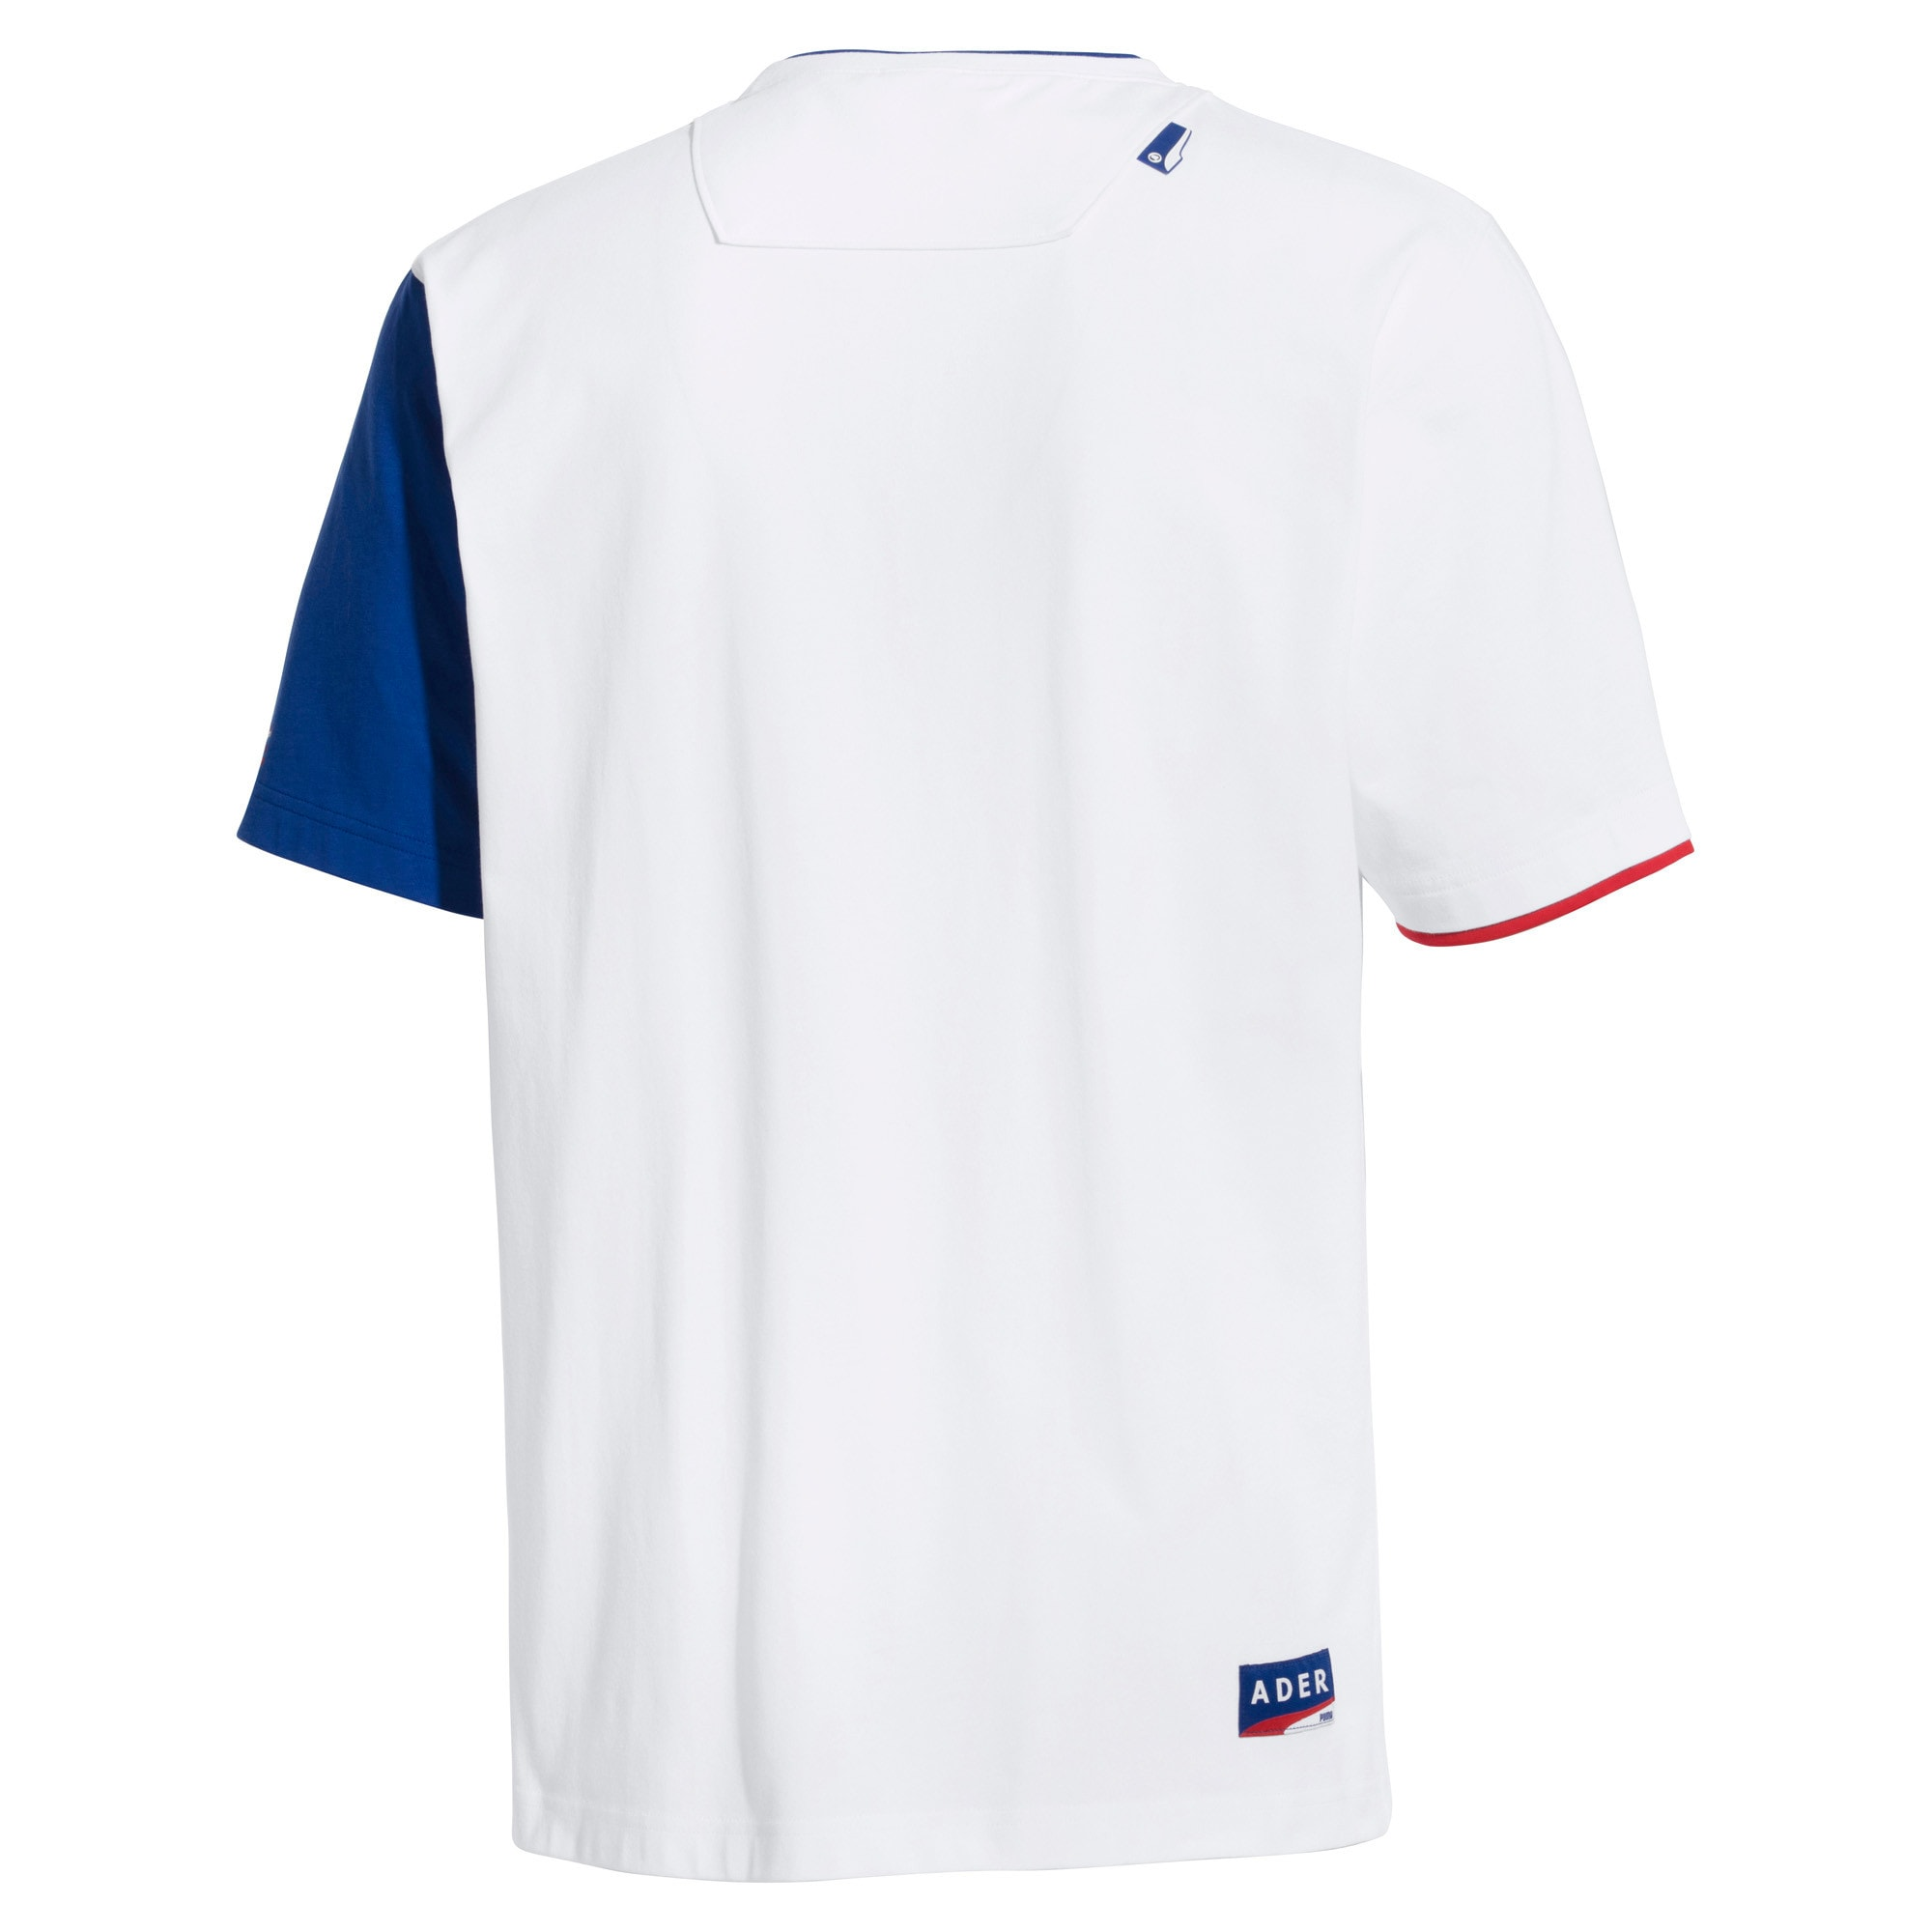 Thumbnail 4 of PUMA x ADER T-Shirt, Puma White, medium